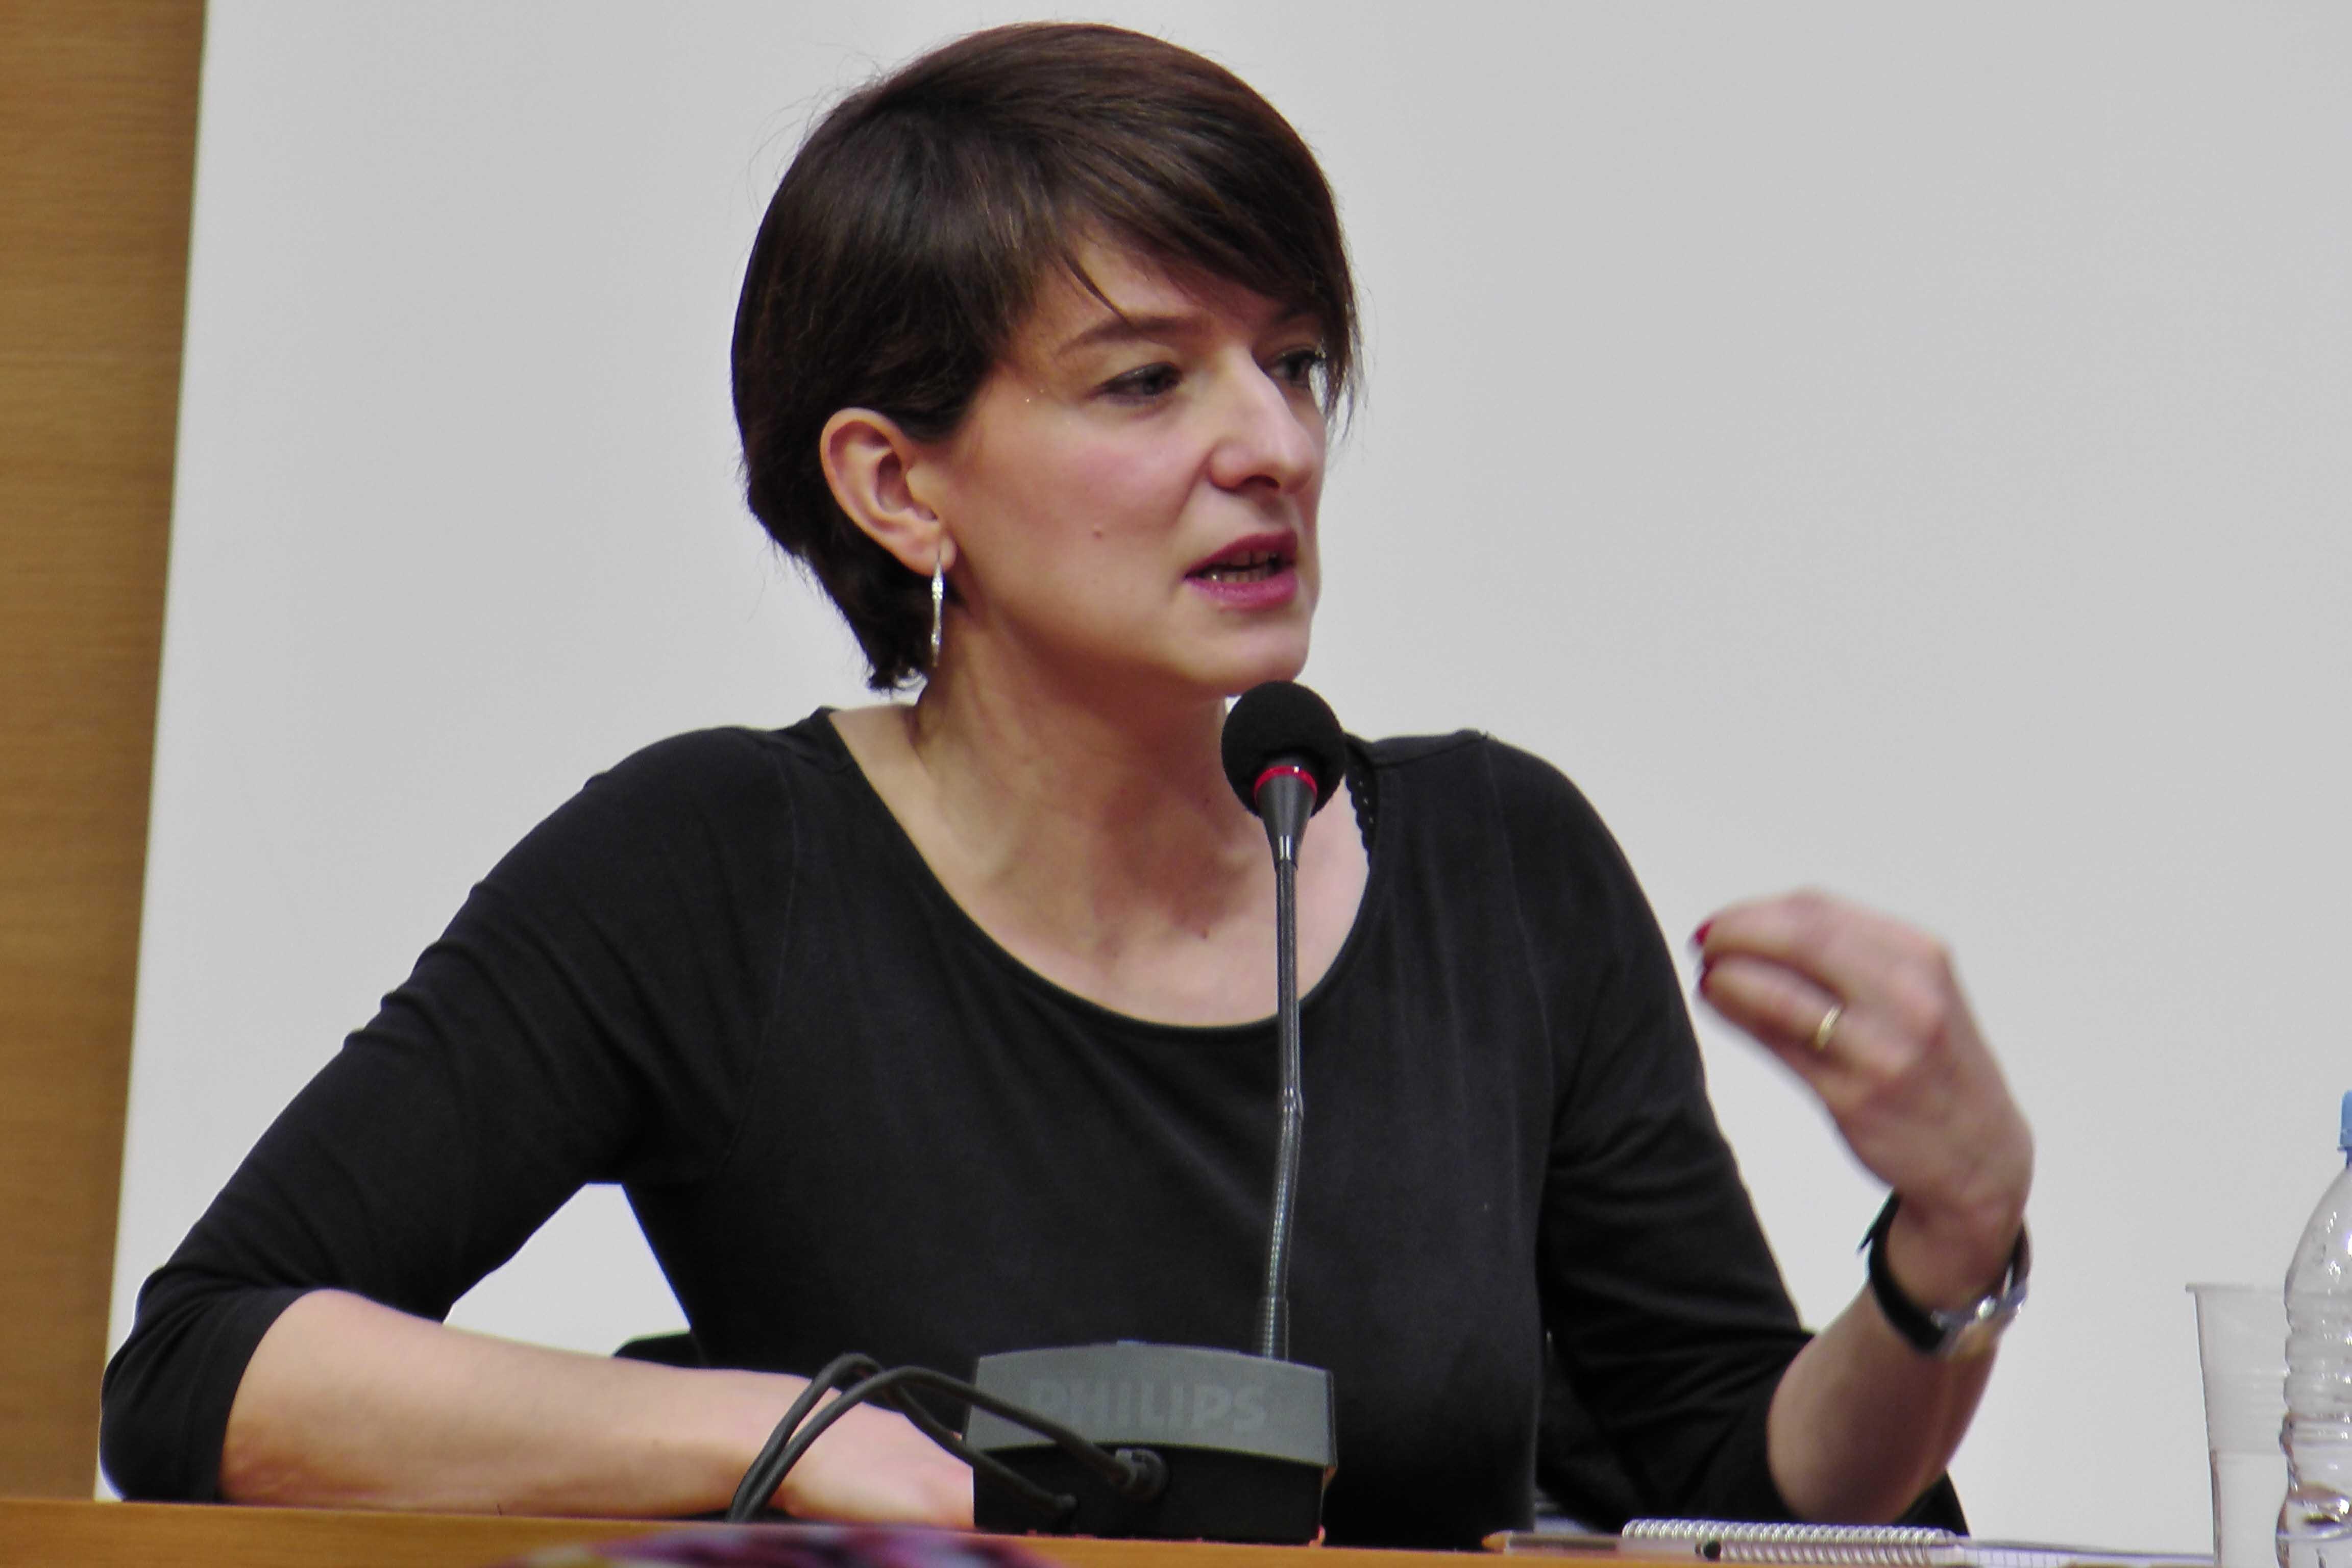 éverine Kodjo-Grandvaux au Collège de France, source : vagabondssanstreves.com